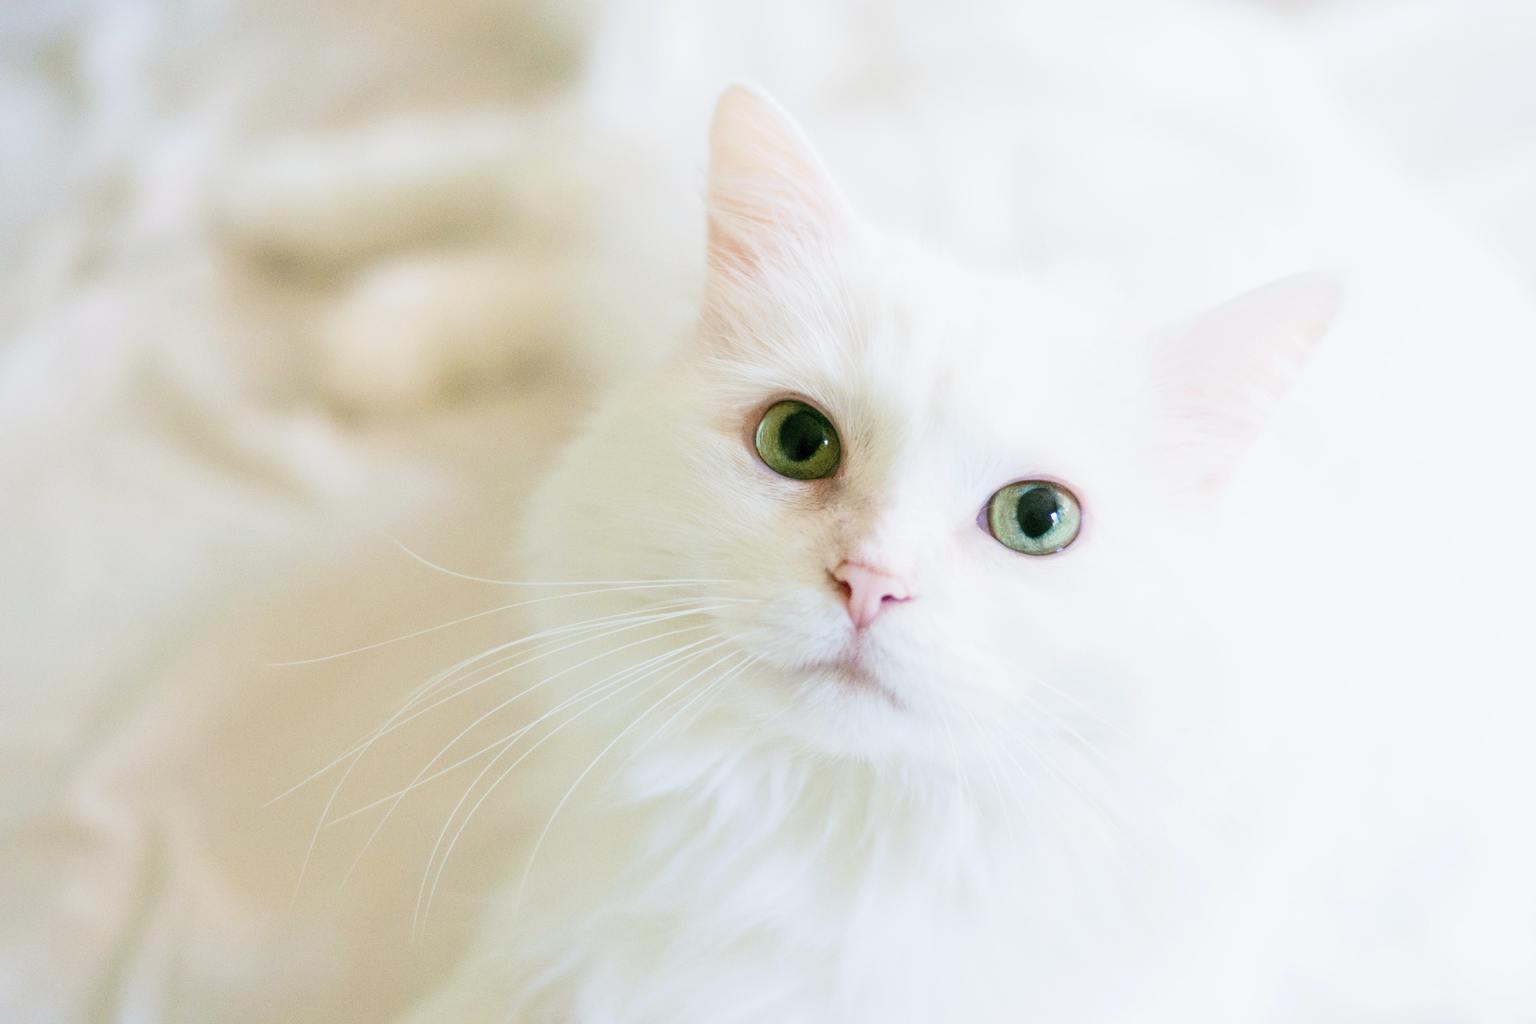 Gato fotografiado con técnica clave alta